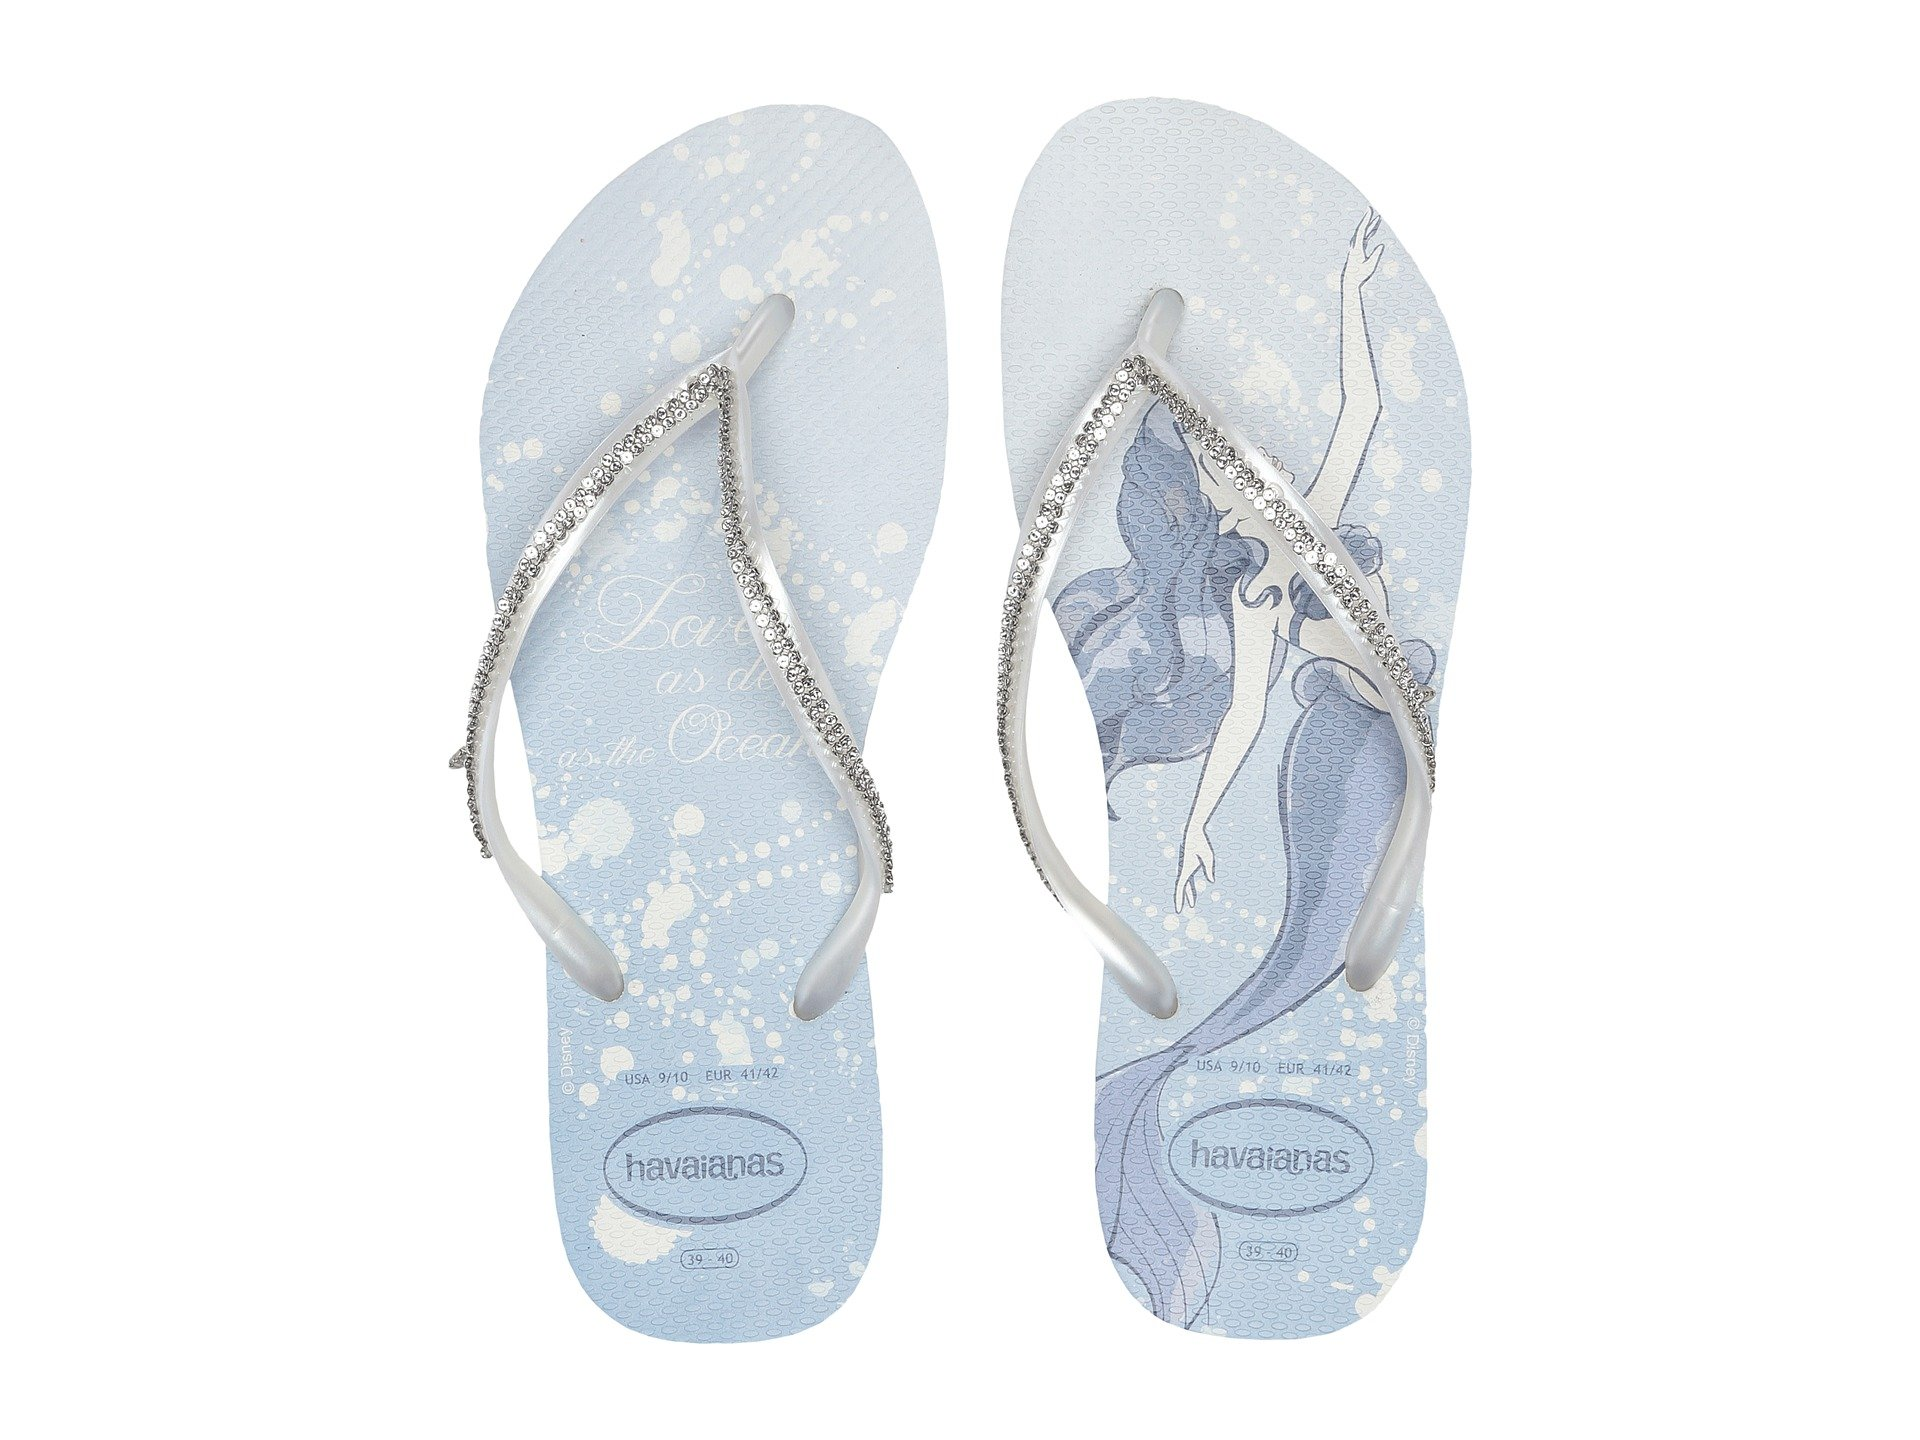 d25acca21 Havaianas Slim Bridal Ariel Sandal In White Metallic Ariel